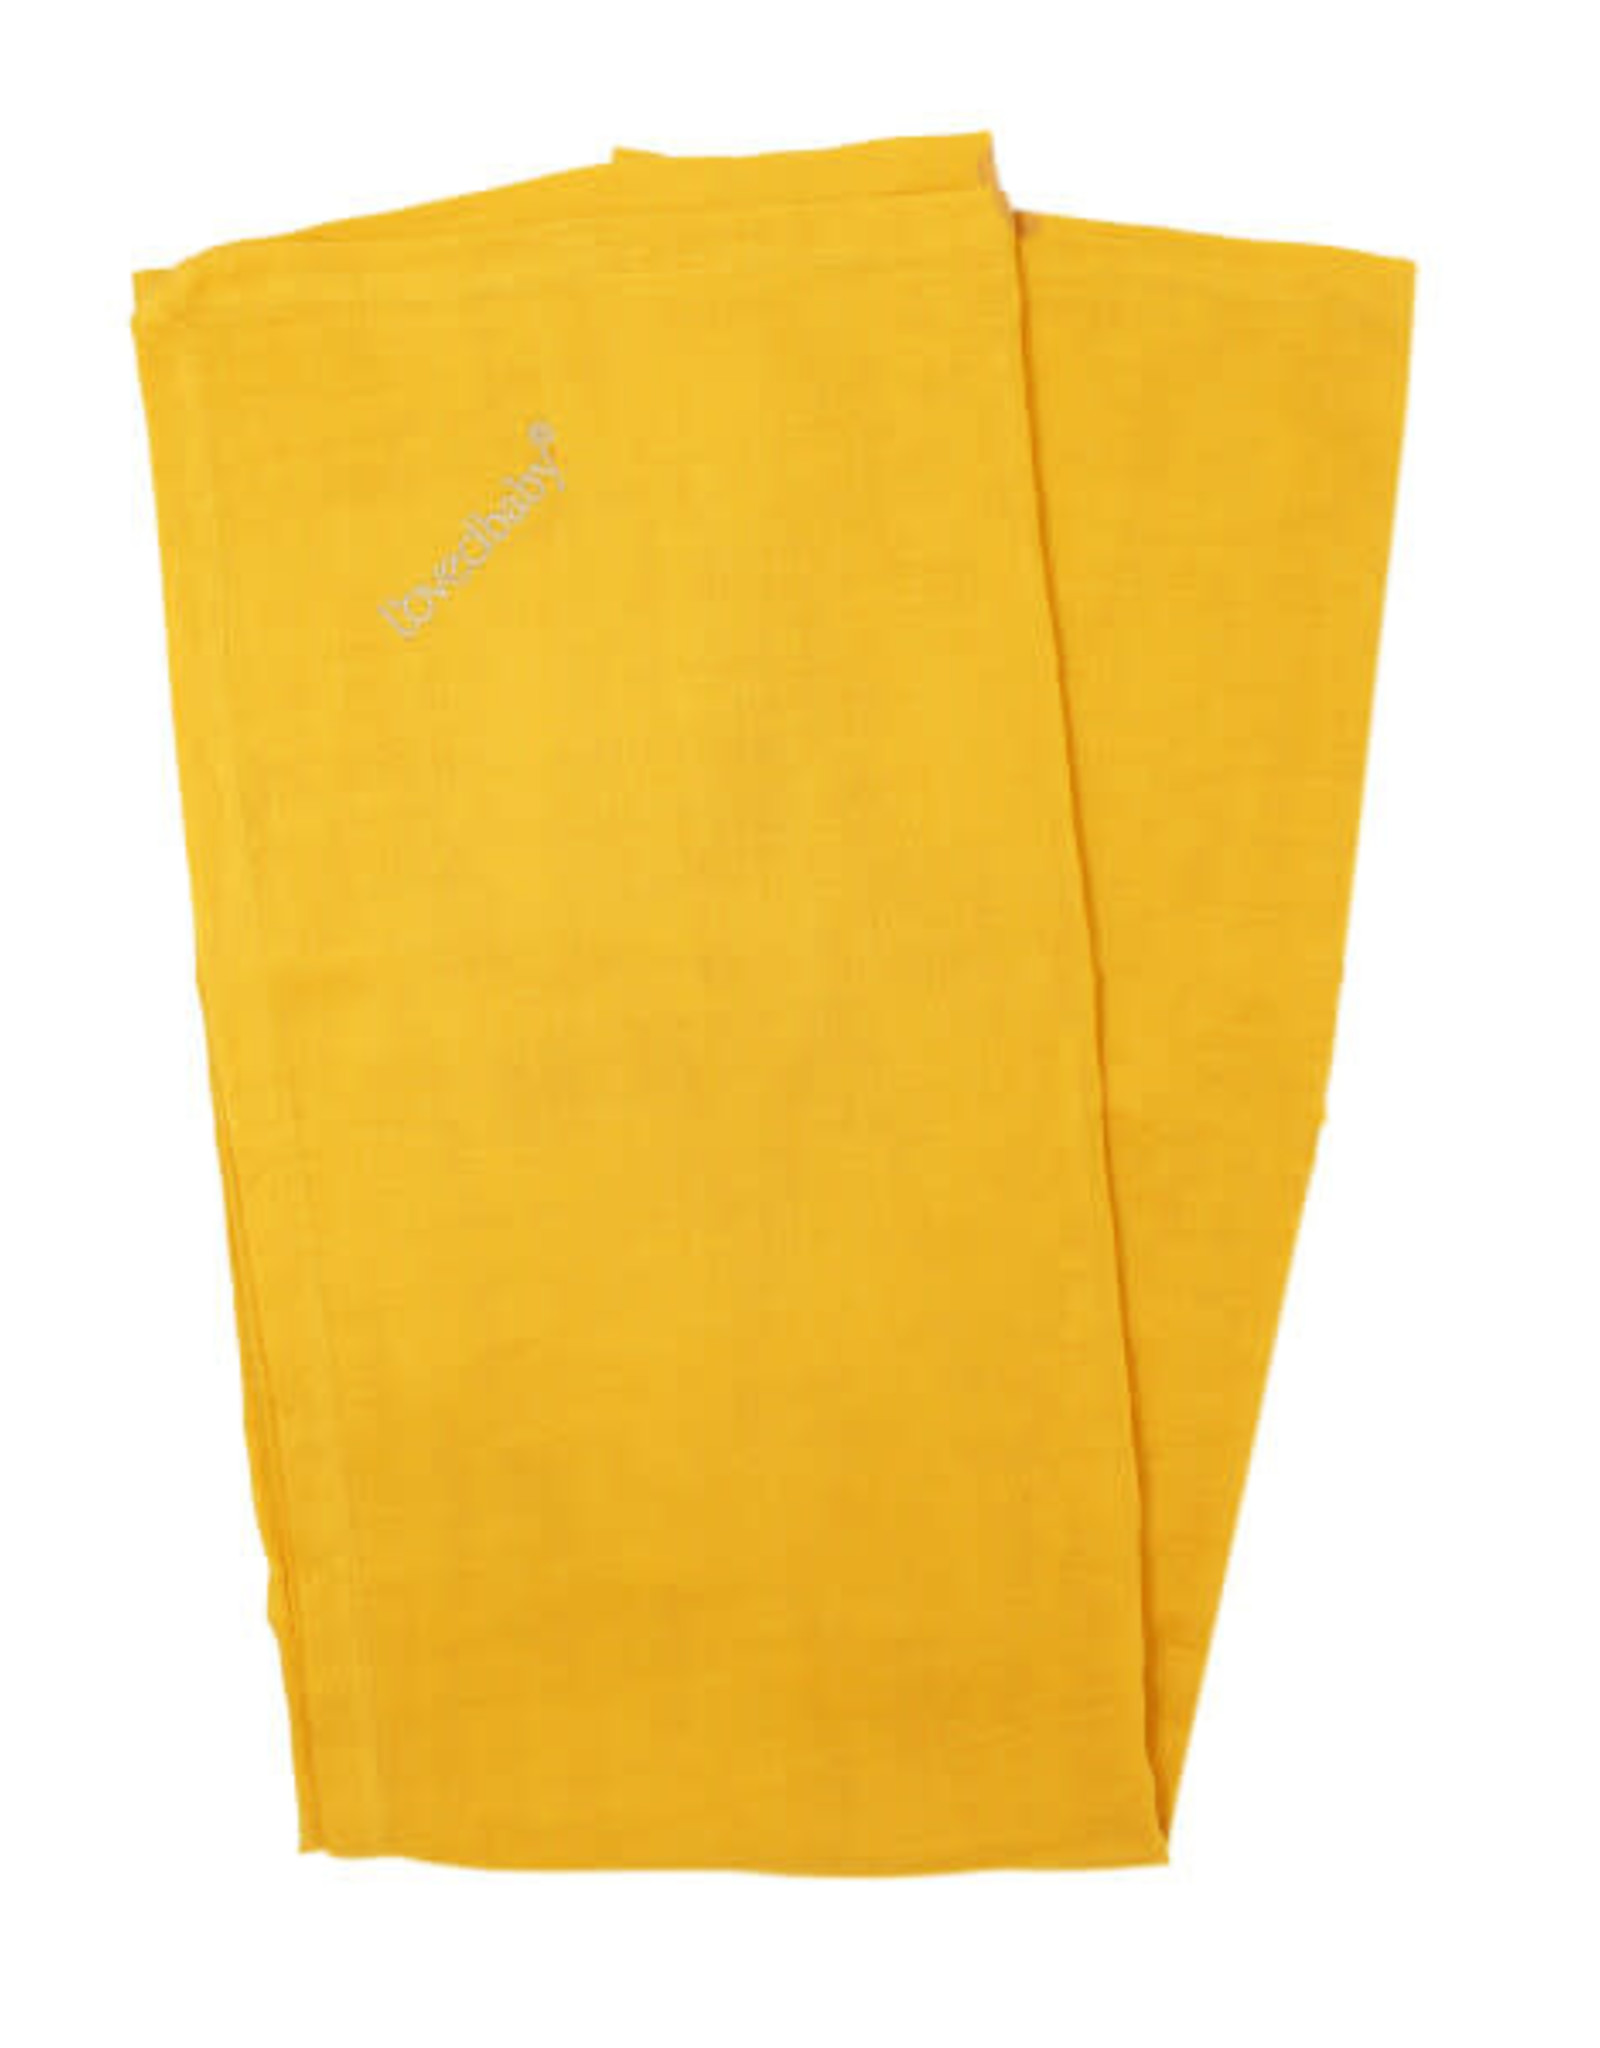 L'oved Baby Muslin Security Blanket Saffron